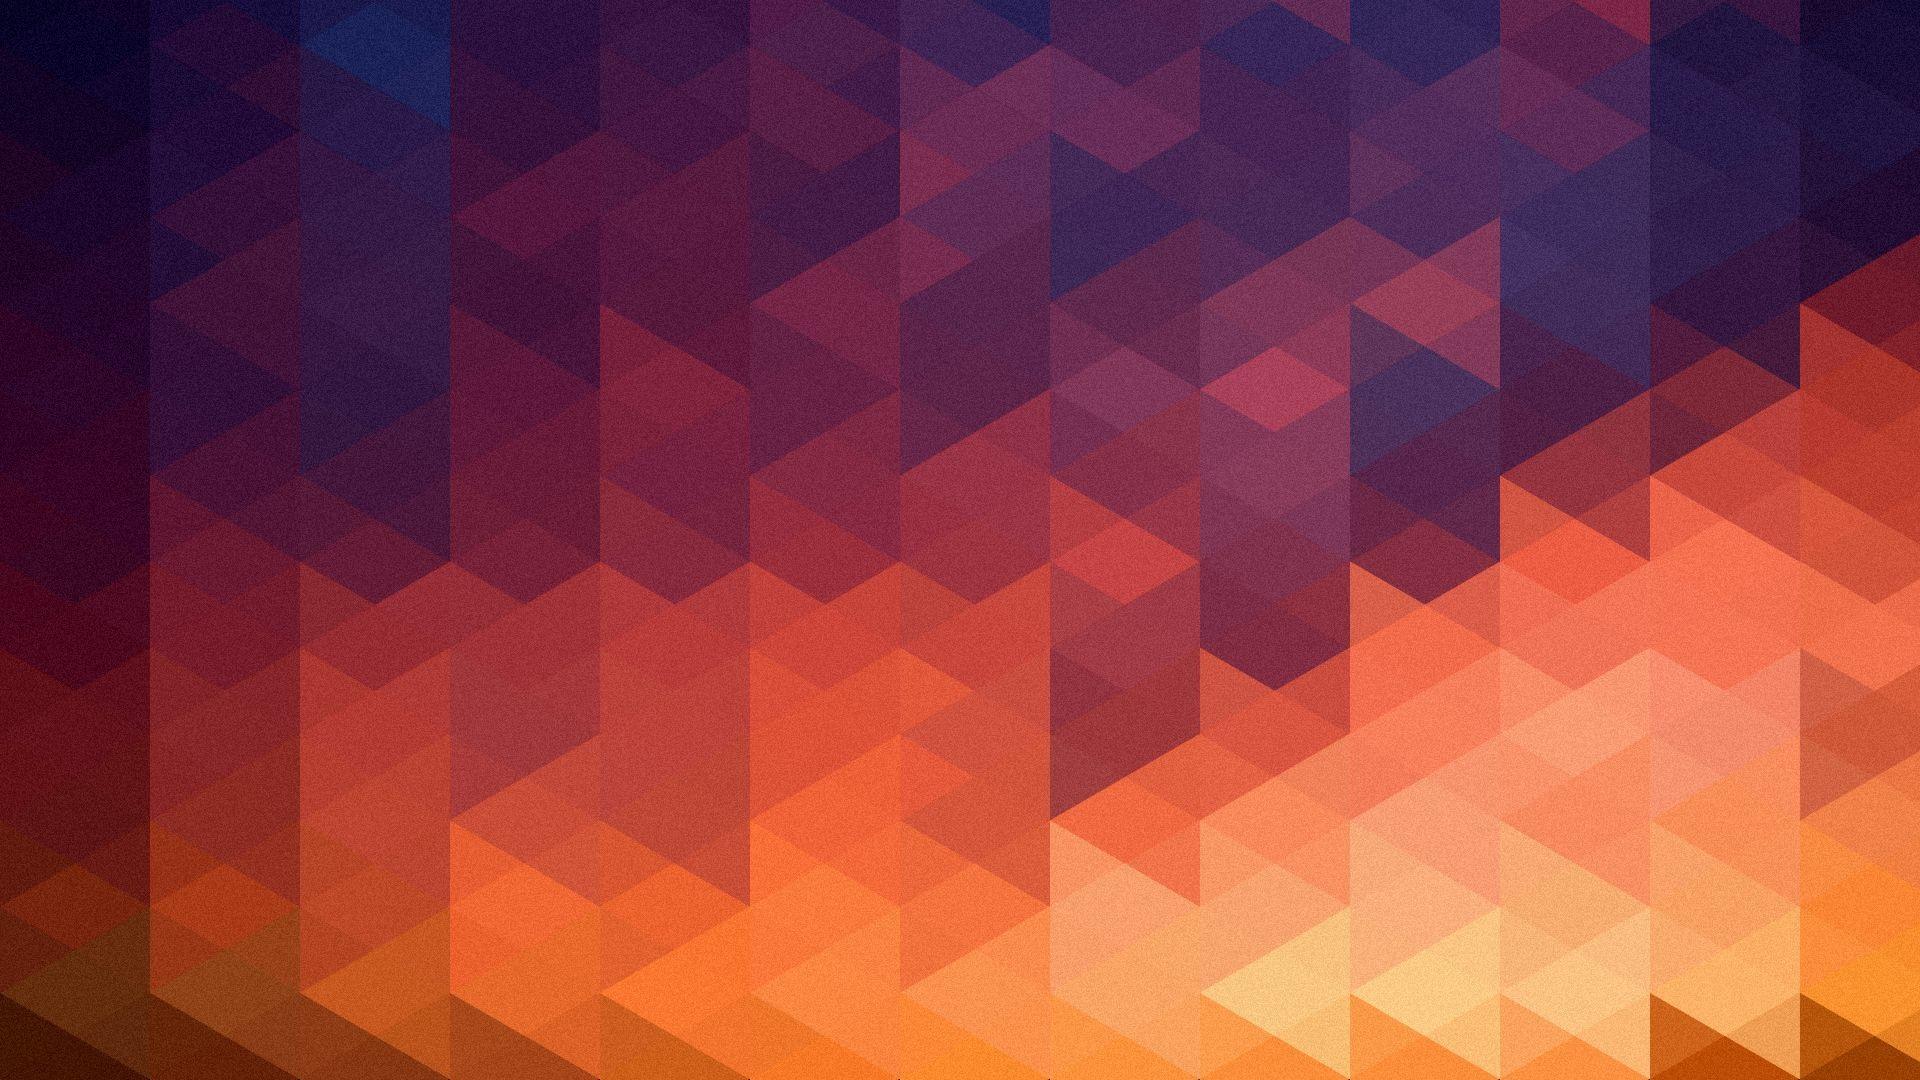 Great Wallpaper High Resolution Geometric - 104664  Trends_97913.jpg